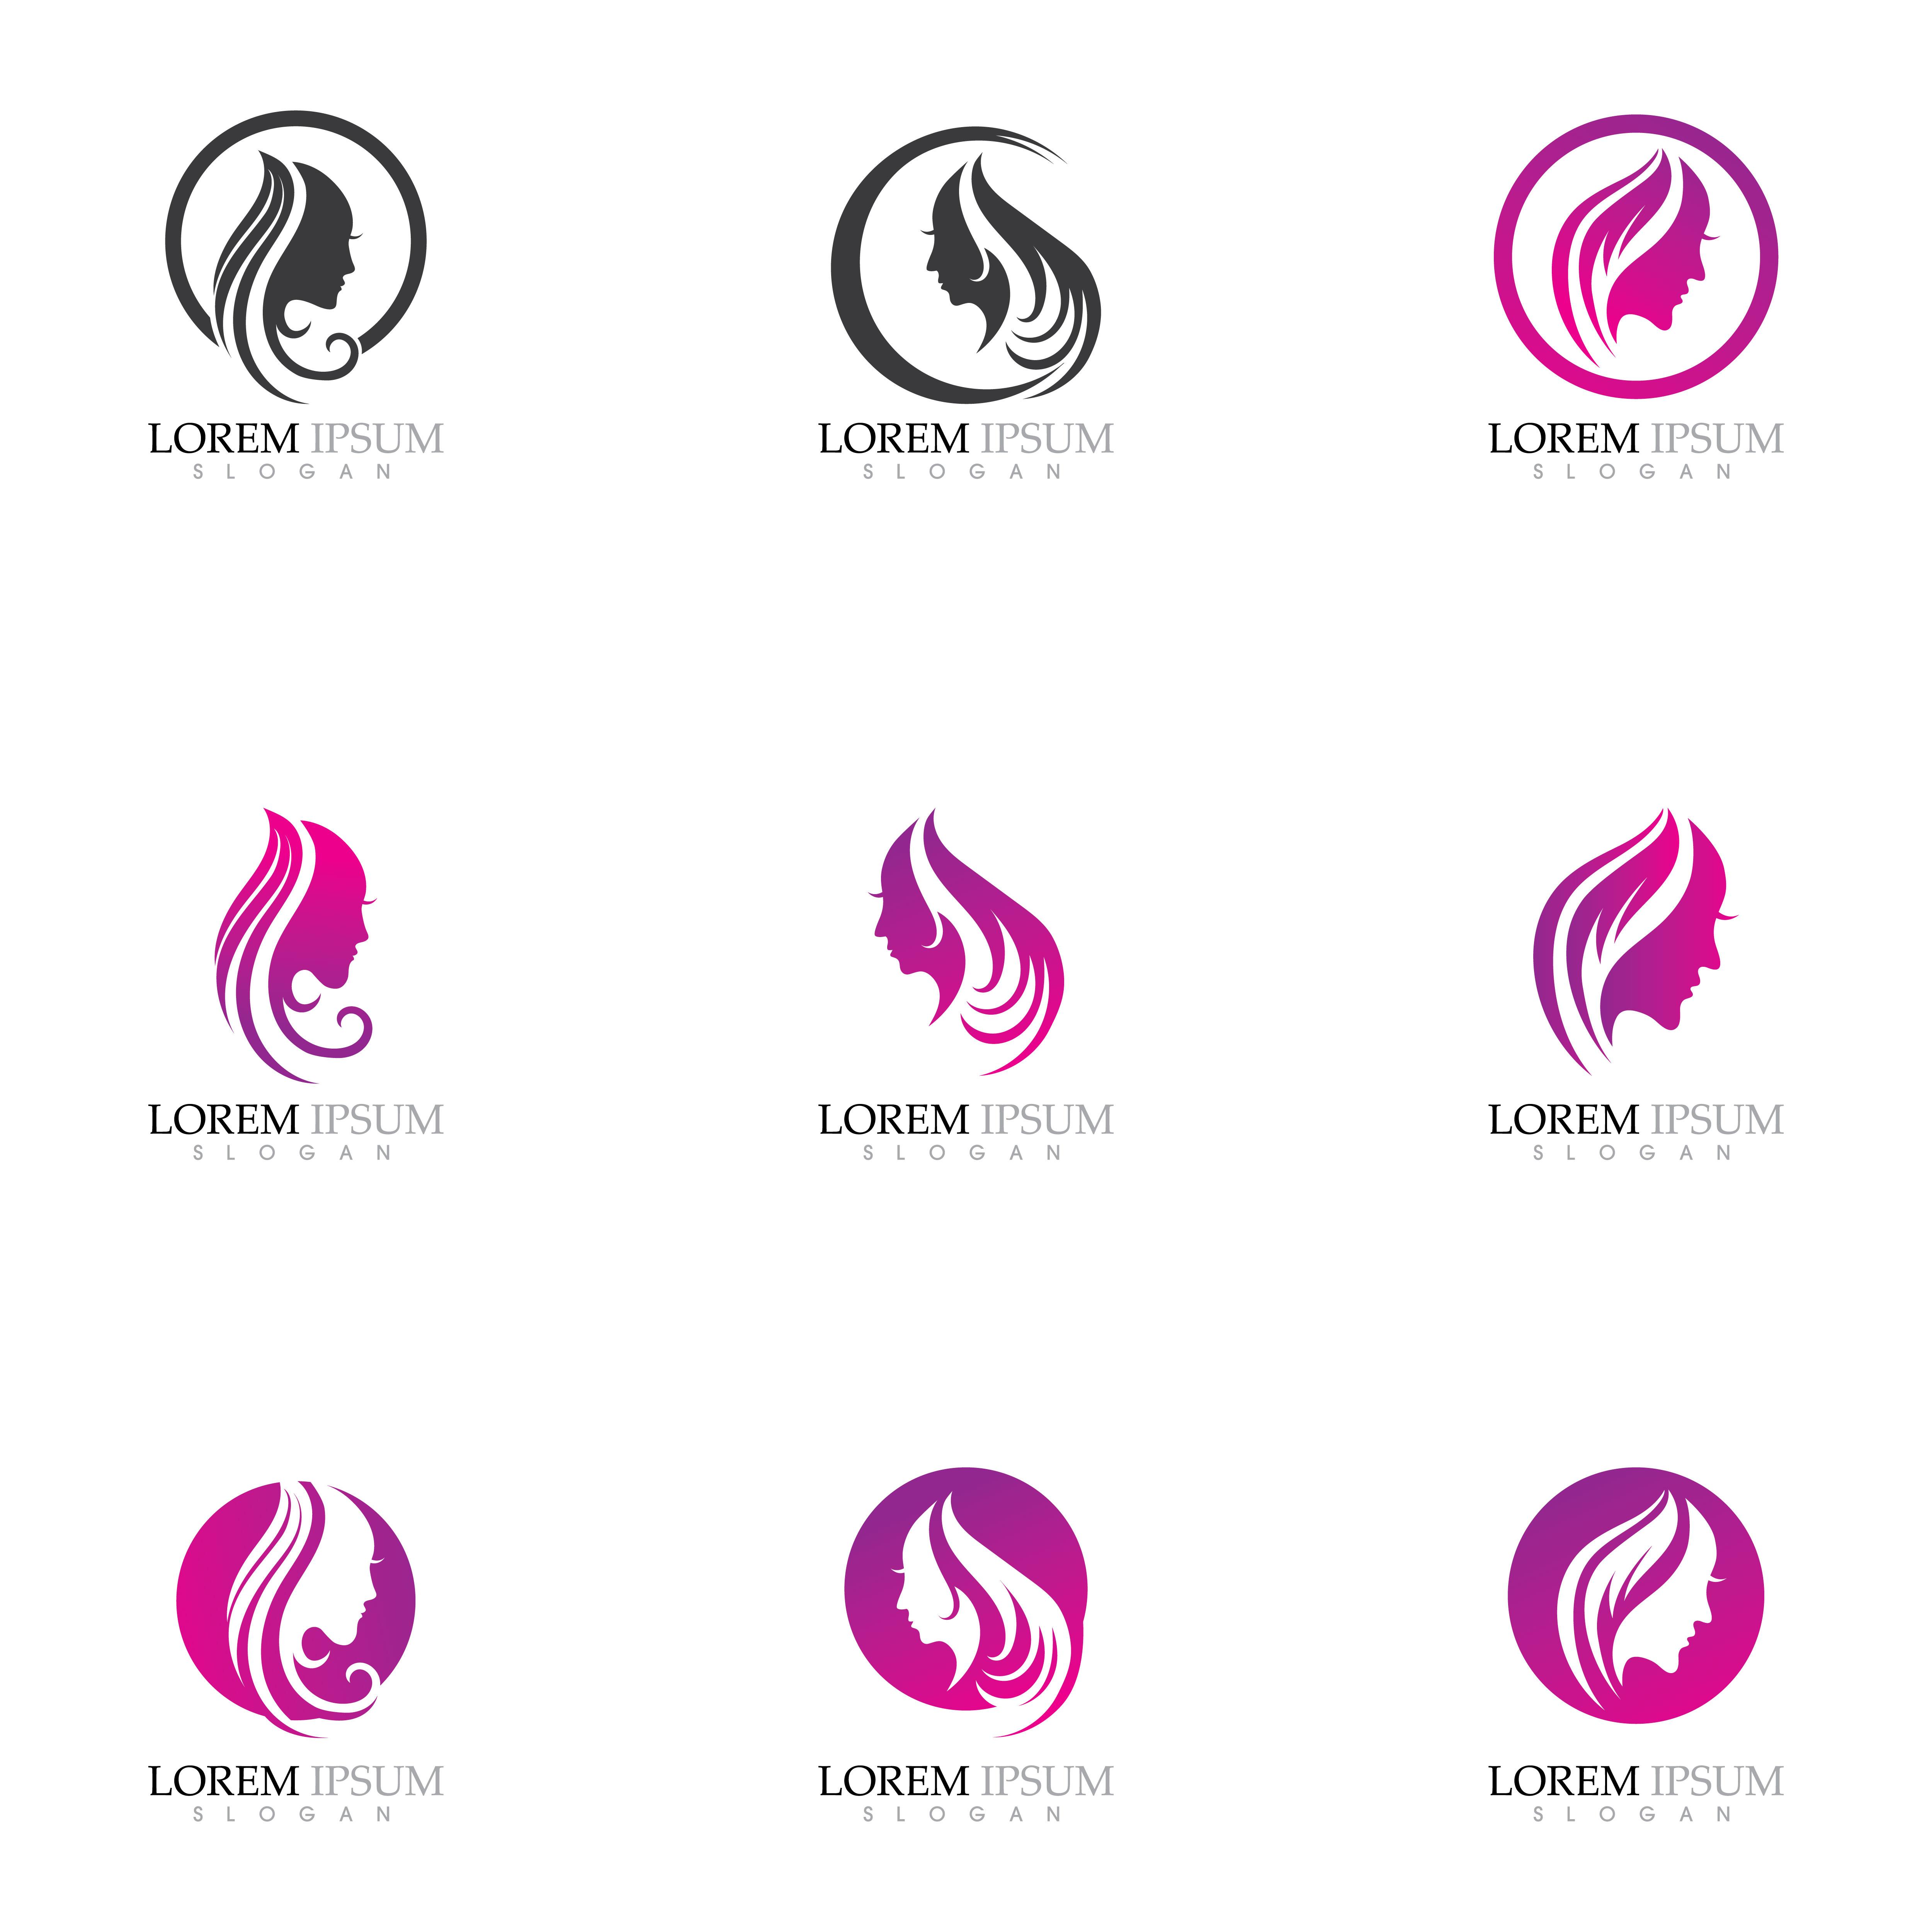 Beauty Women Face Silhouette Character Logo Download Free Vectors Clipart Graphics Vector Art